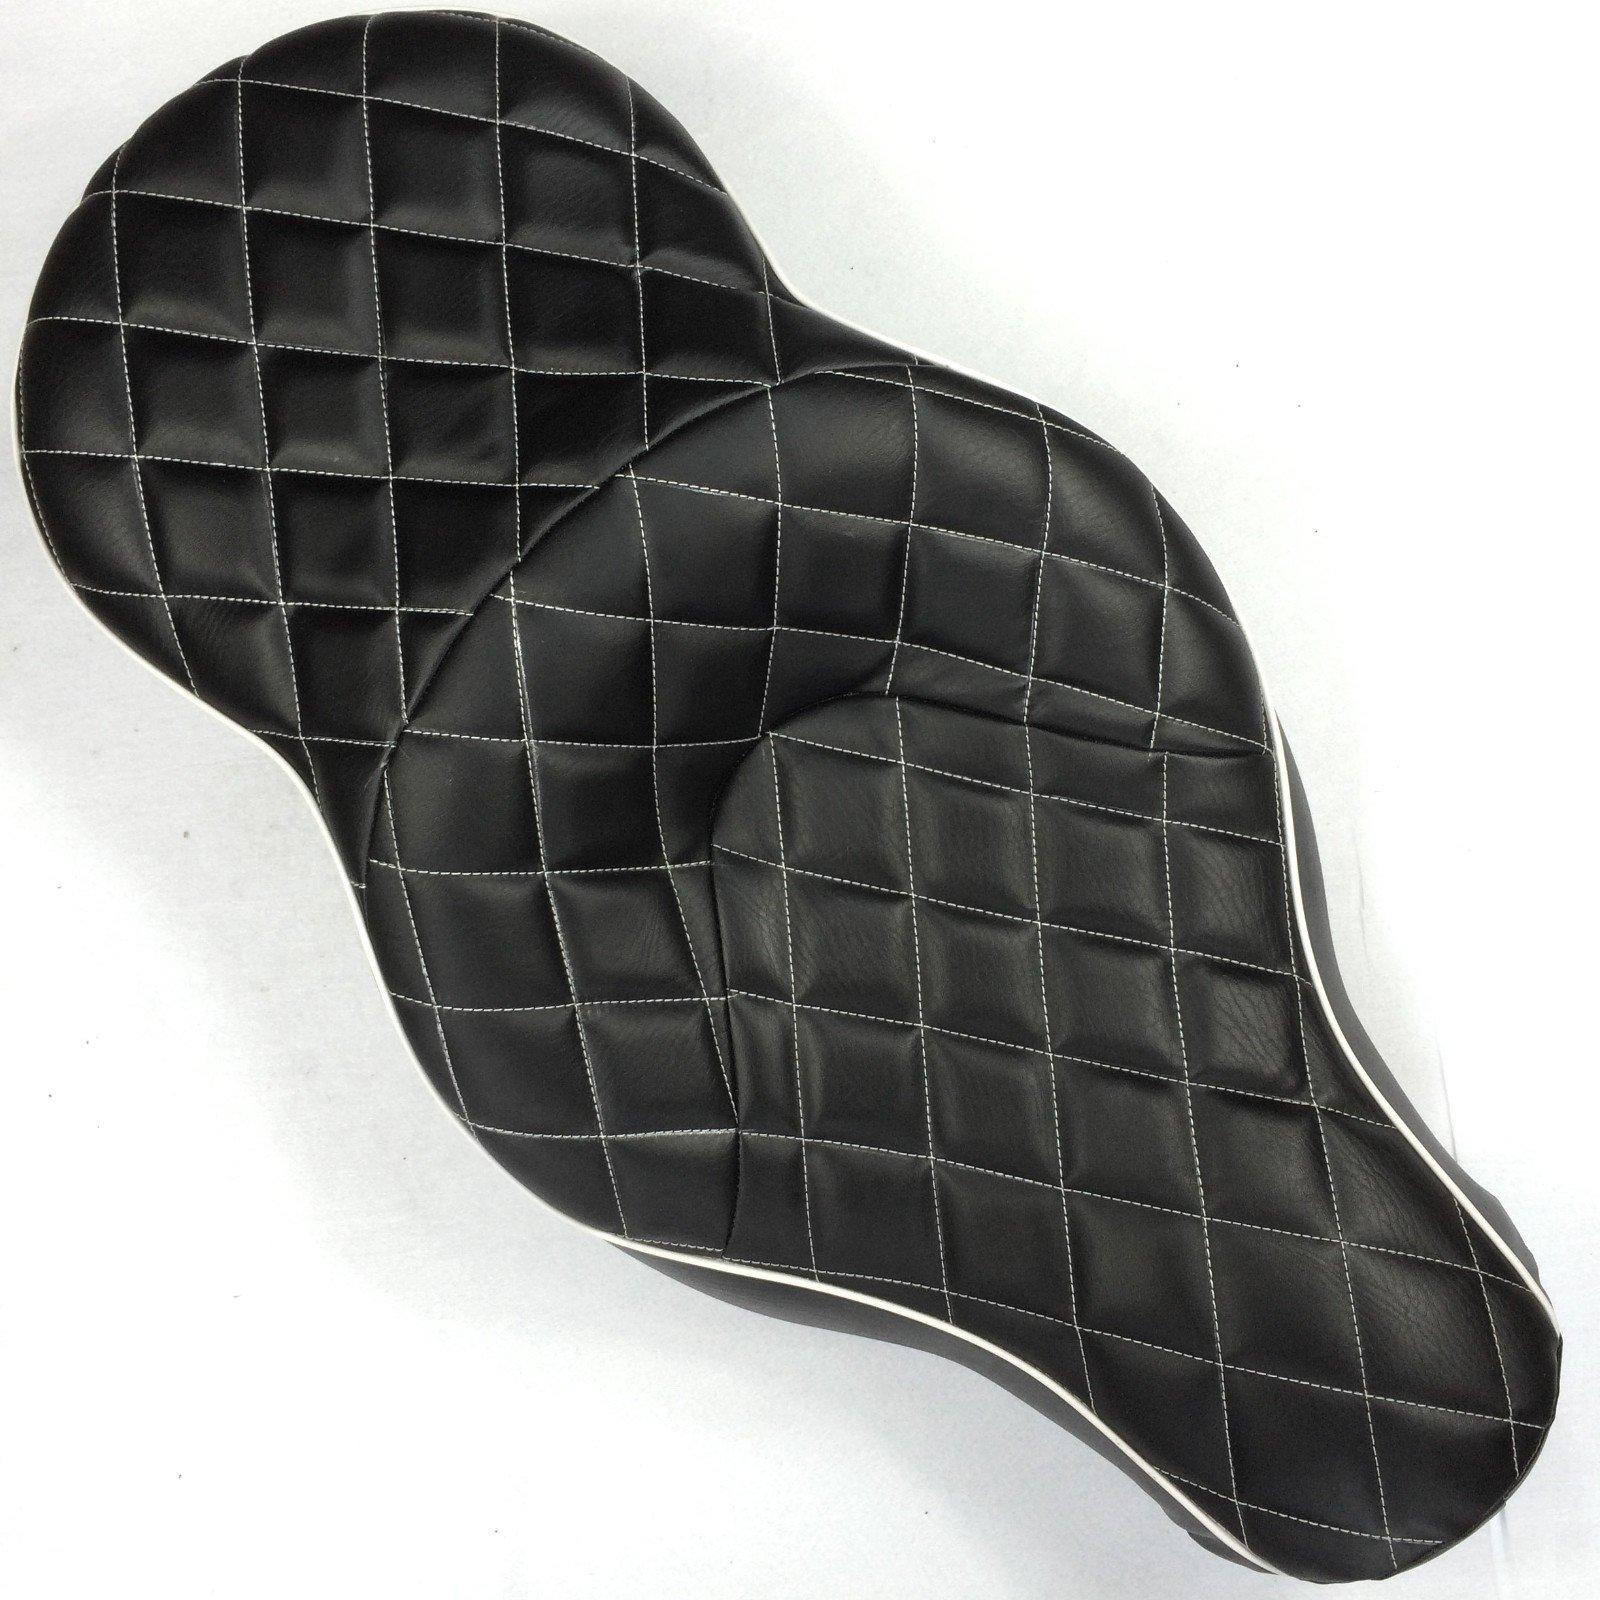 HTT Motorcycle Black Custom Thick Driver Passenger 2-up Diamond Stitch Style Leather Seat For 2005 2006 2007 2008 2009 2010 2011 2012 2013 Harley Davidson XL883N XL883L XL883X